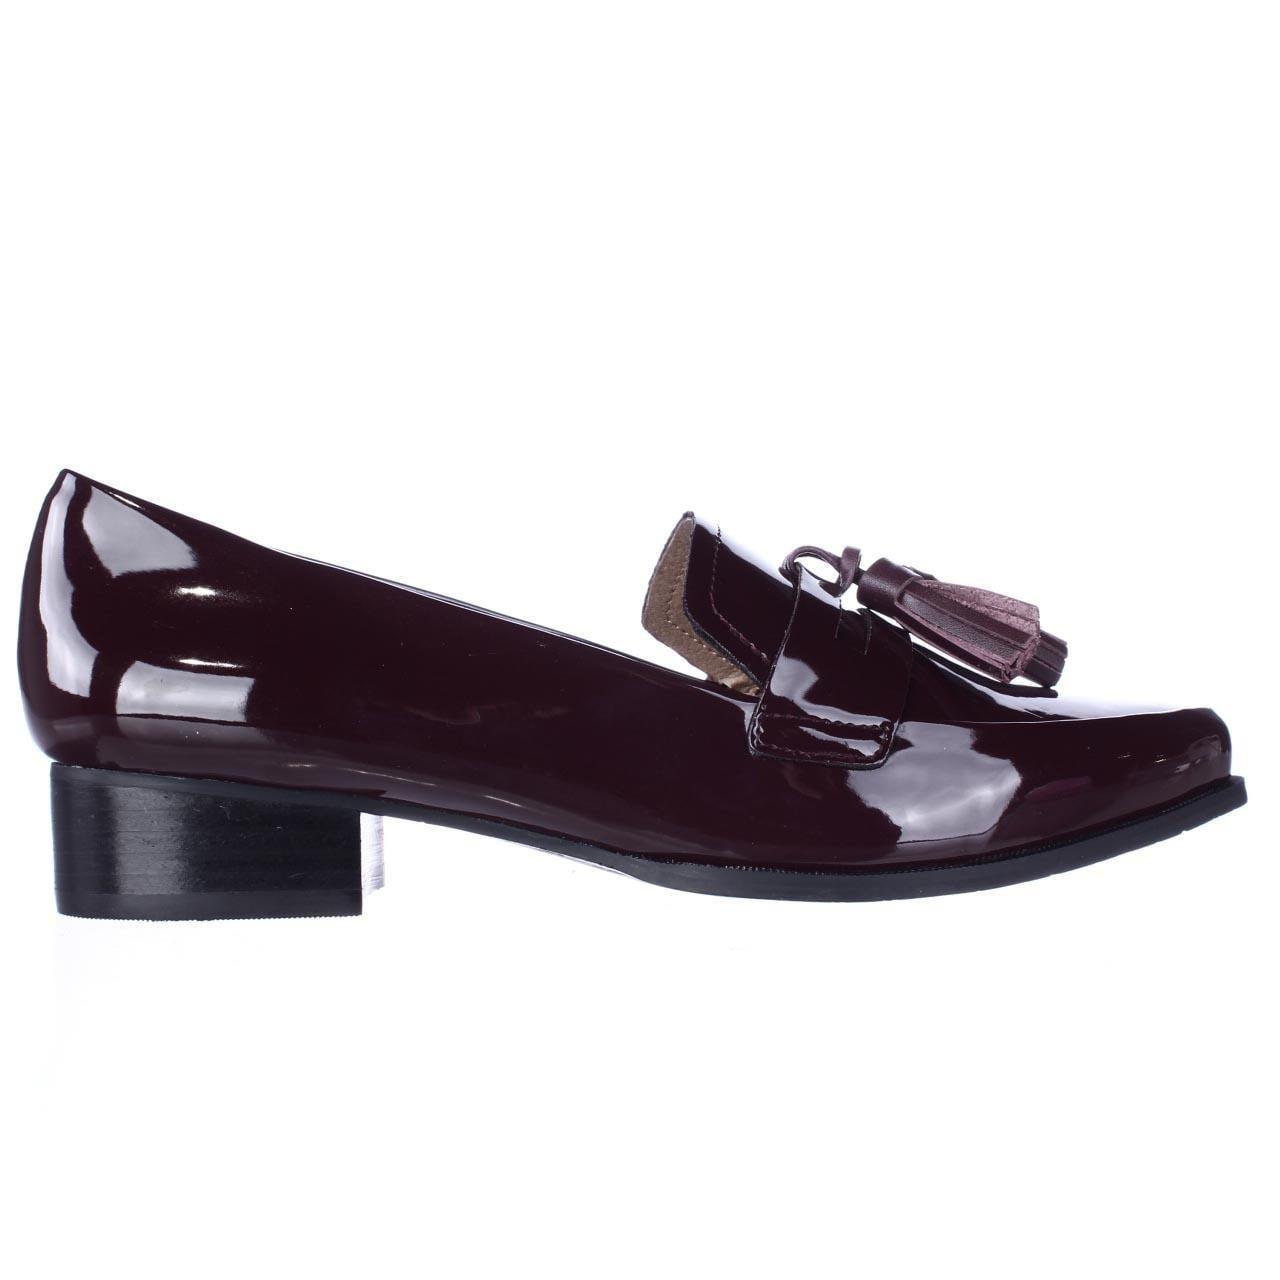 afc8bddc752 Shop Tahari Looker Tassel Penny Loafers